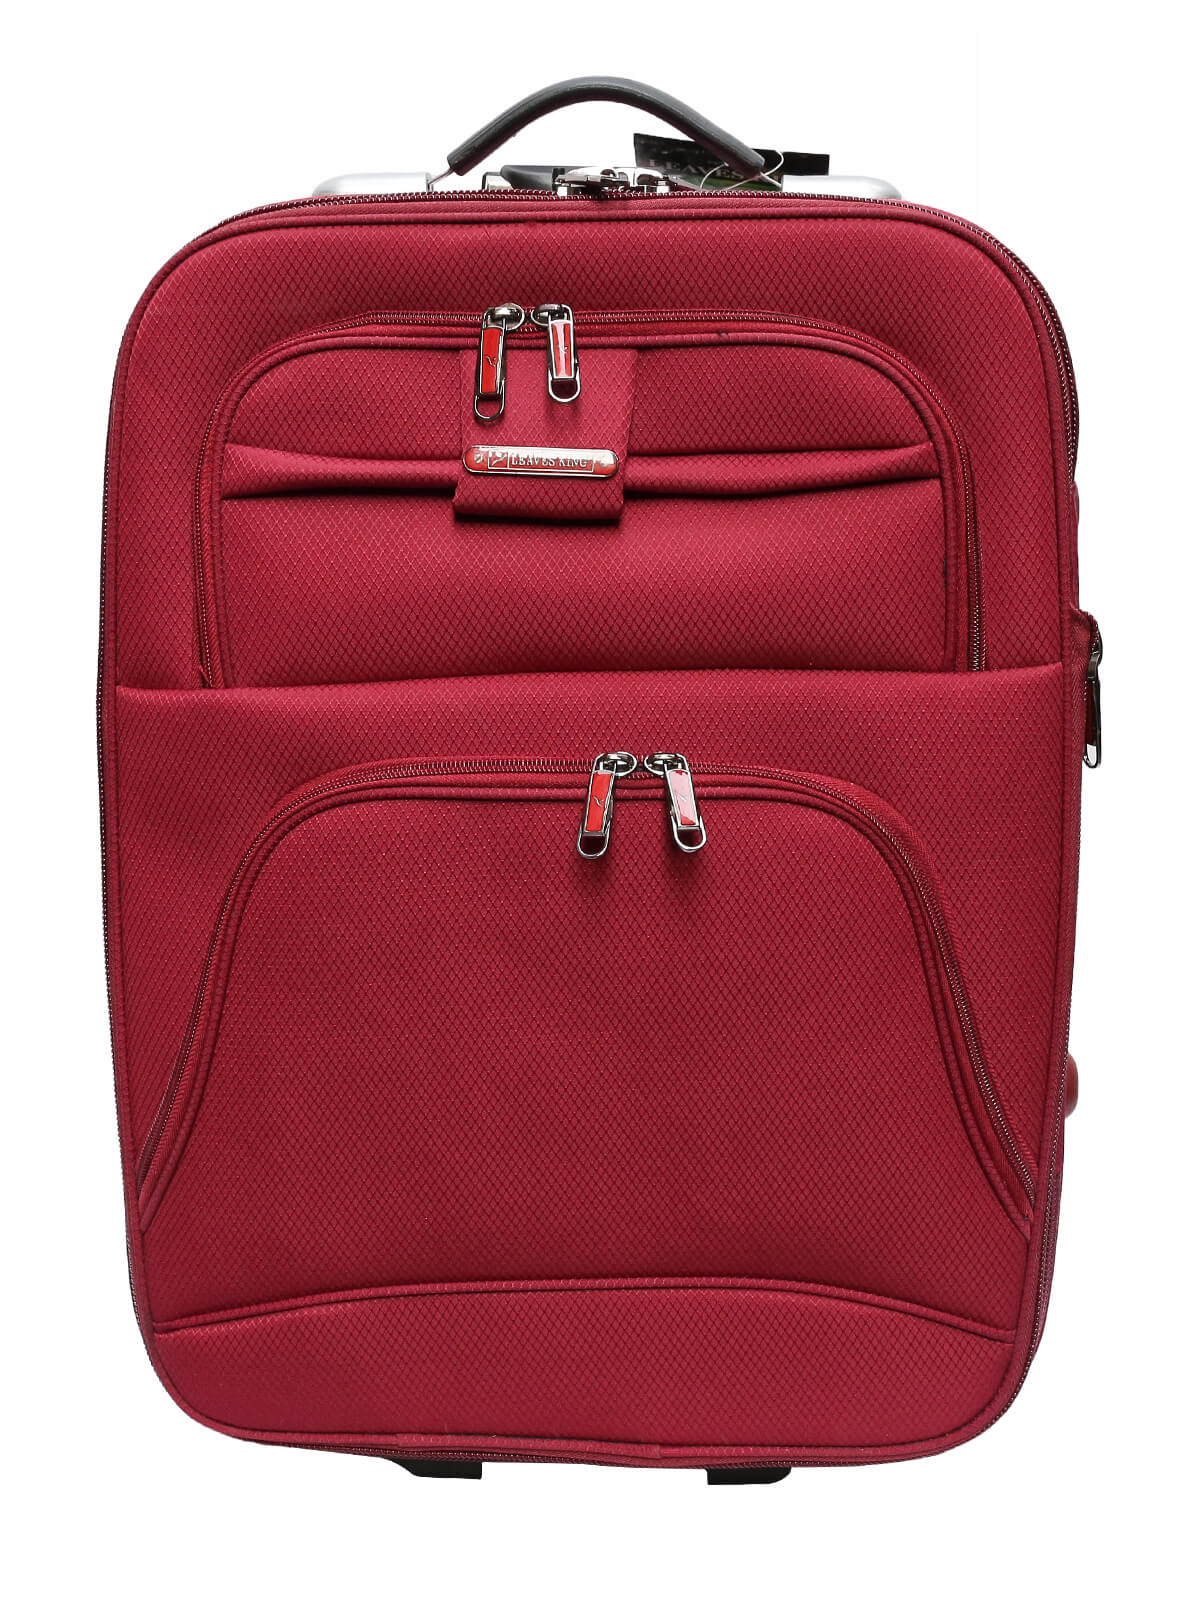 Maroon Hand Luggage Trolley